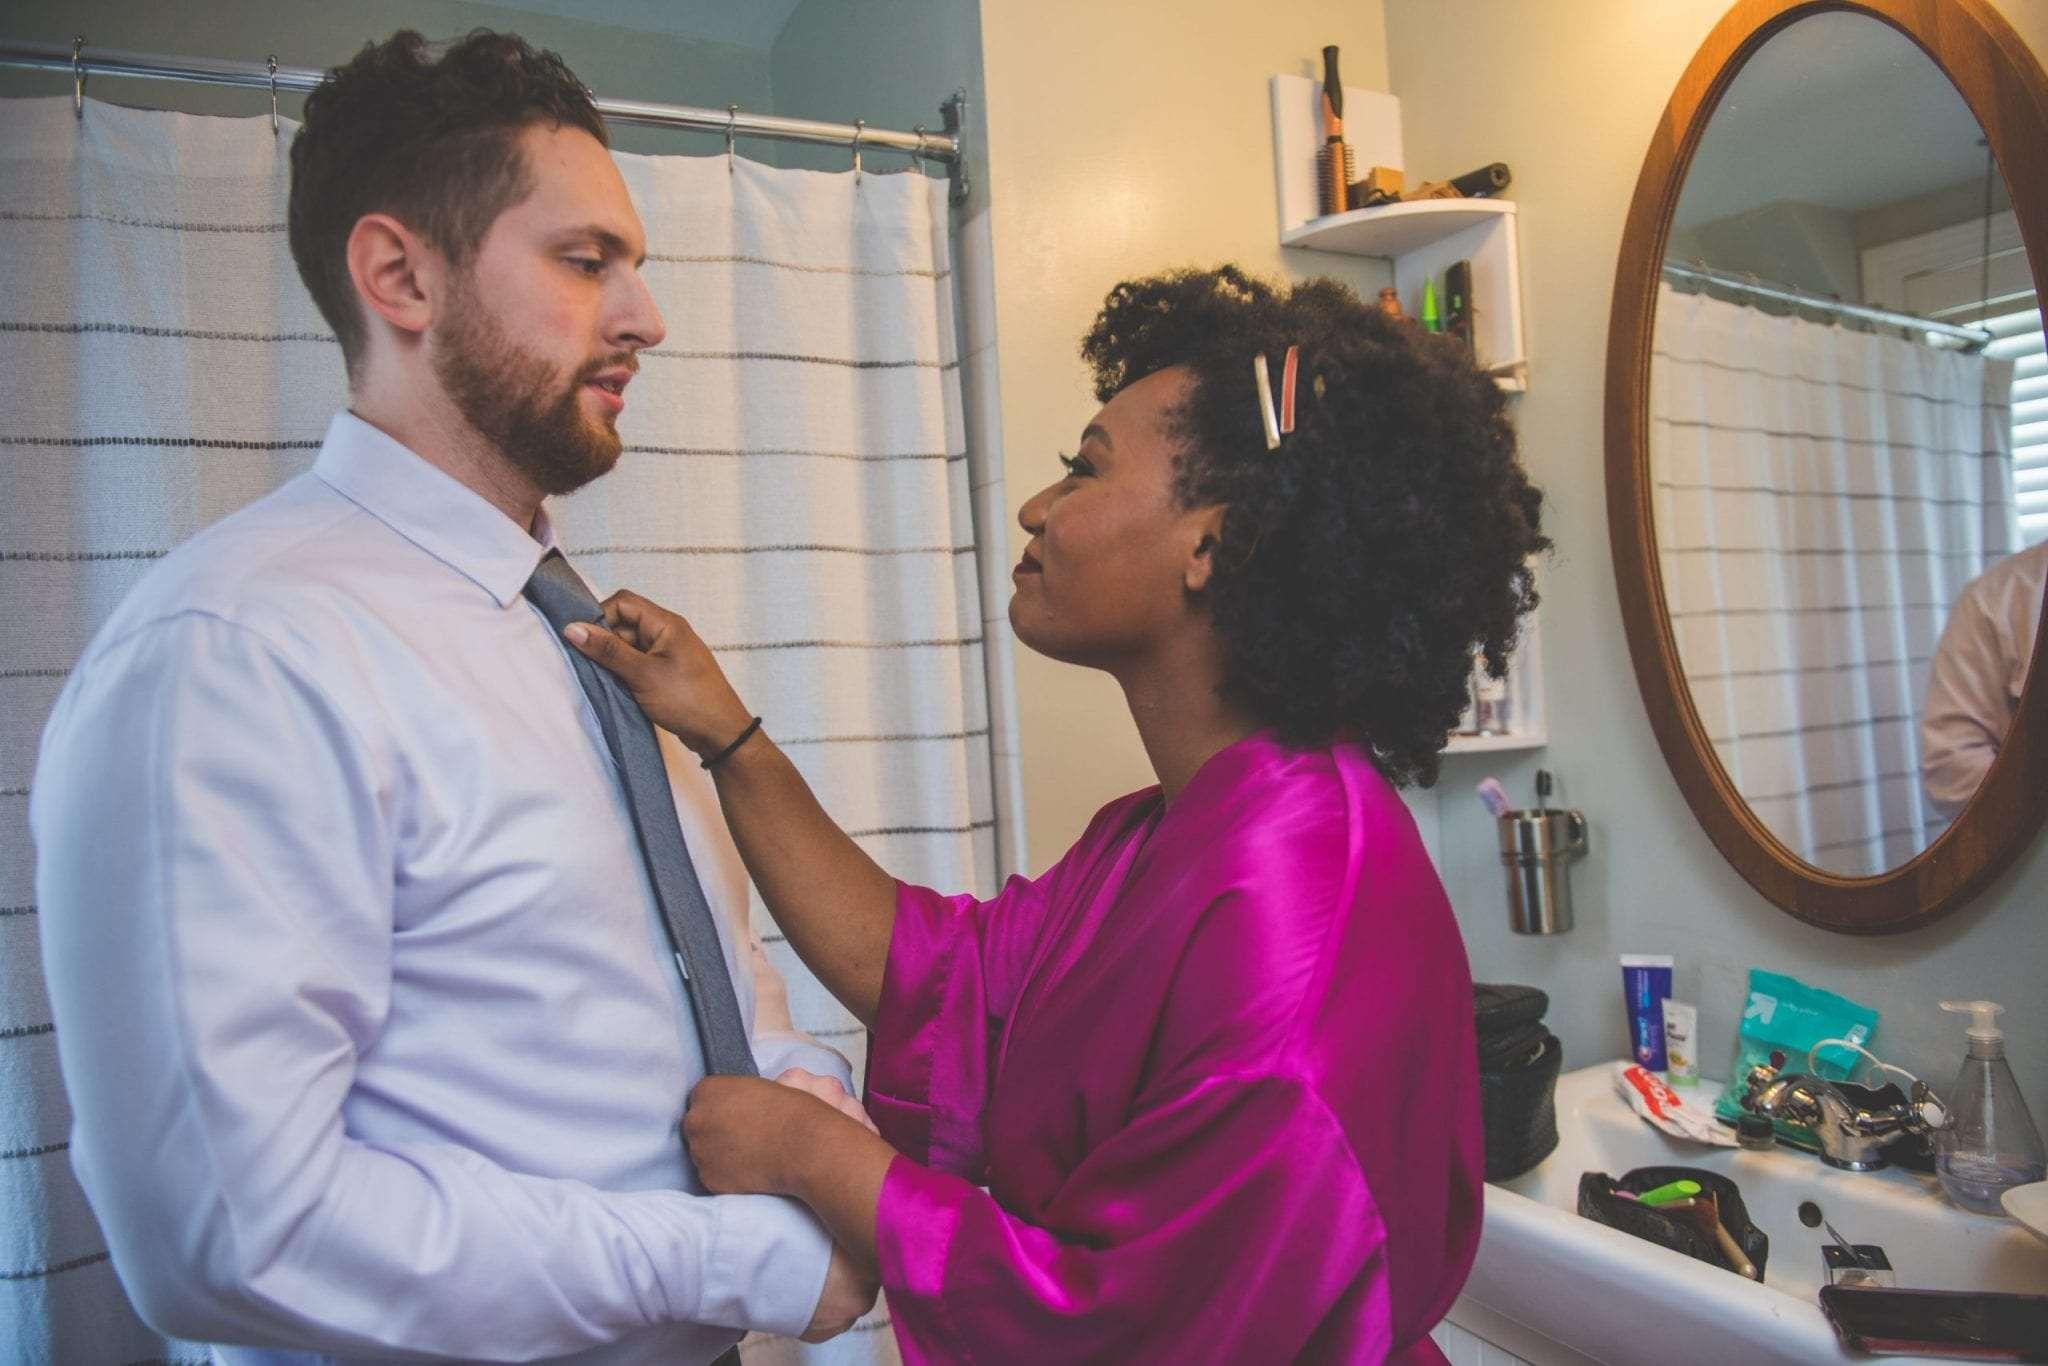 How to photograph a micro wedding NJ photographer